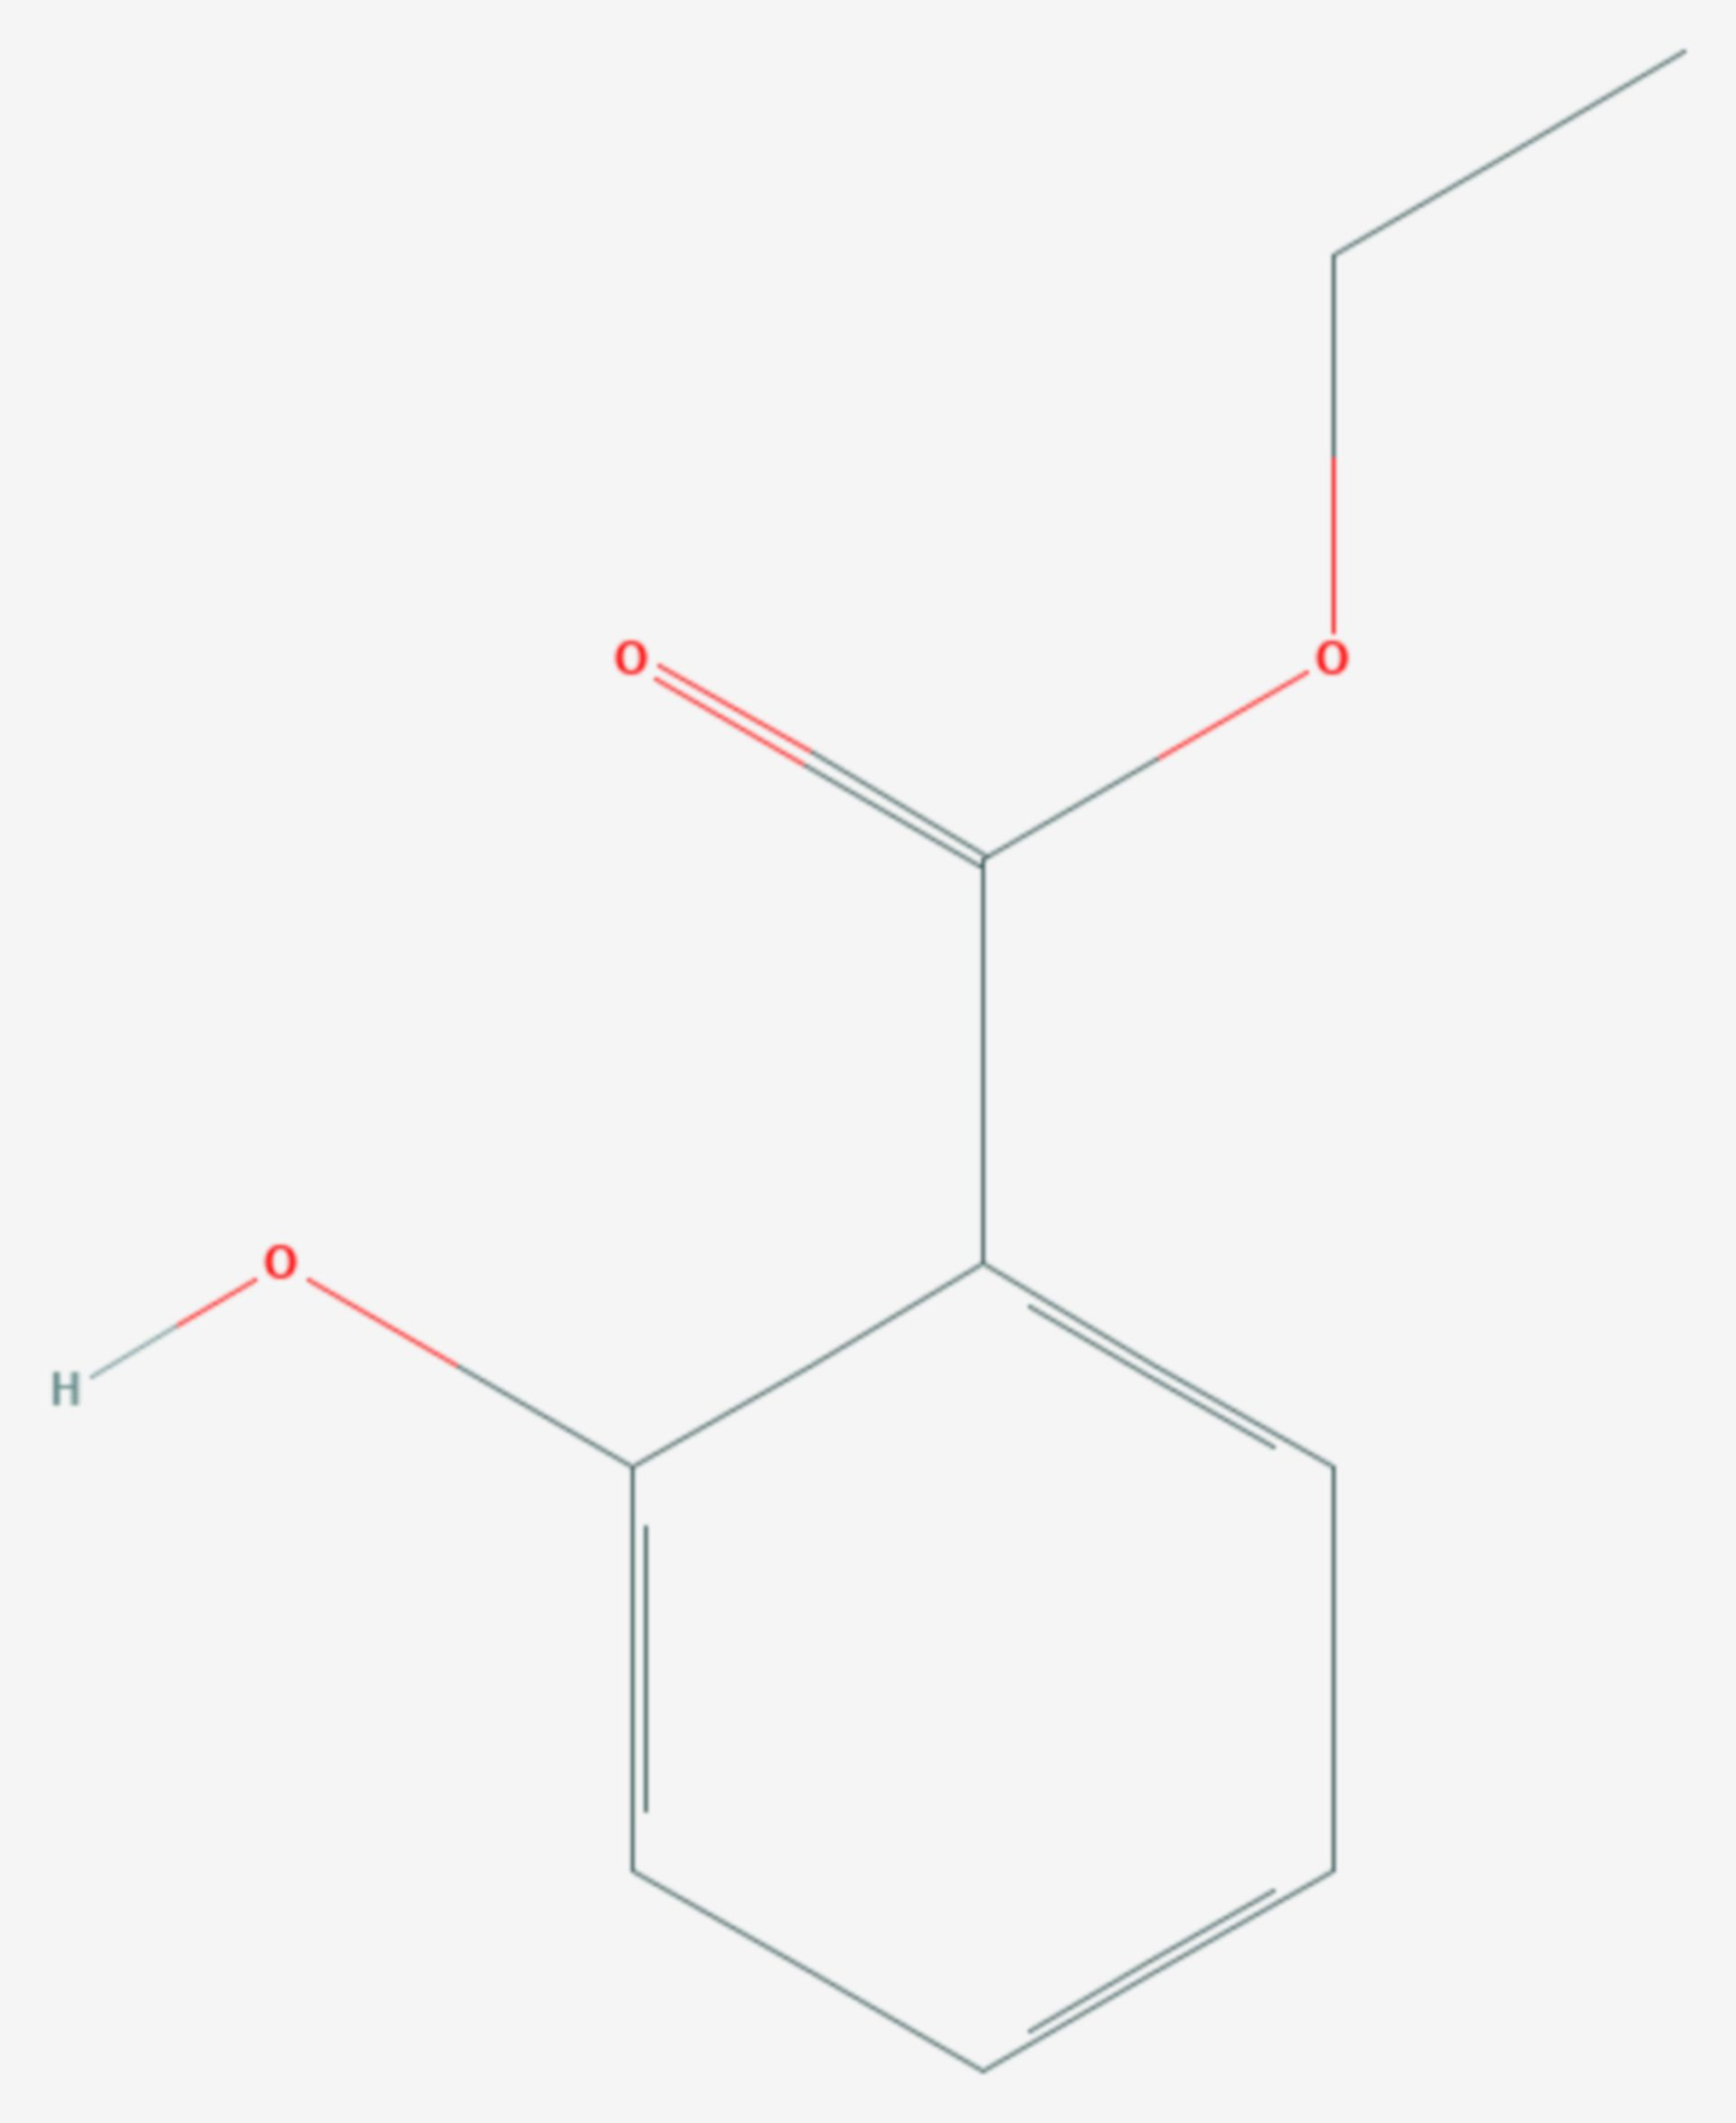 Salicylsäureethylester (Strukturformel)